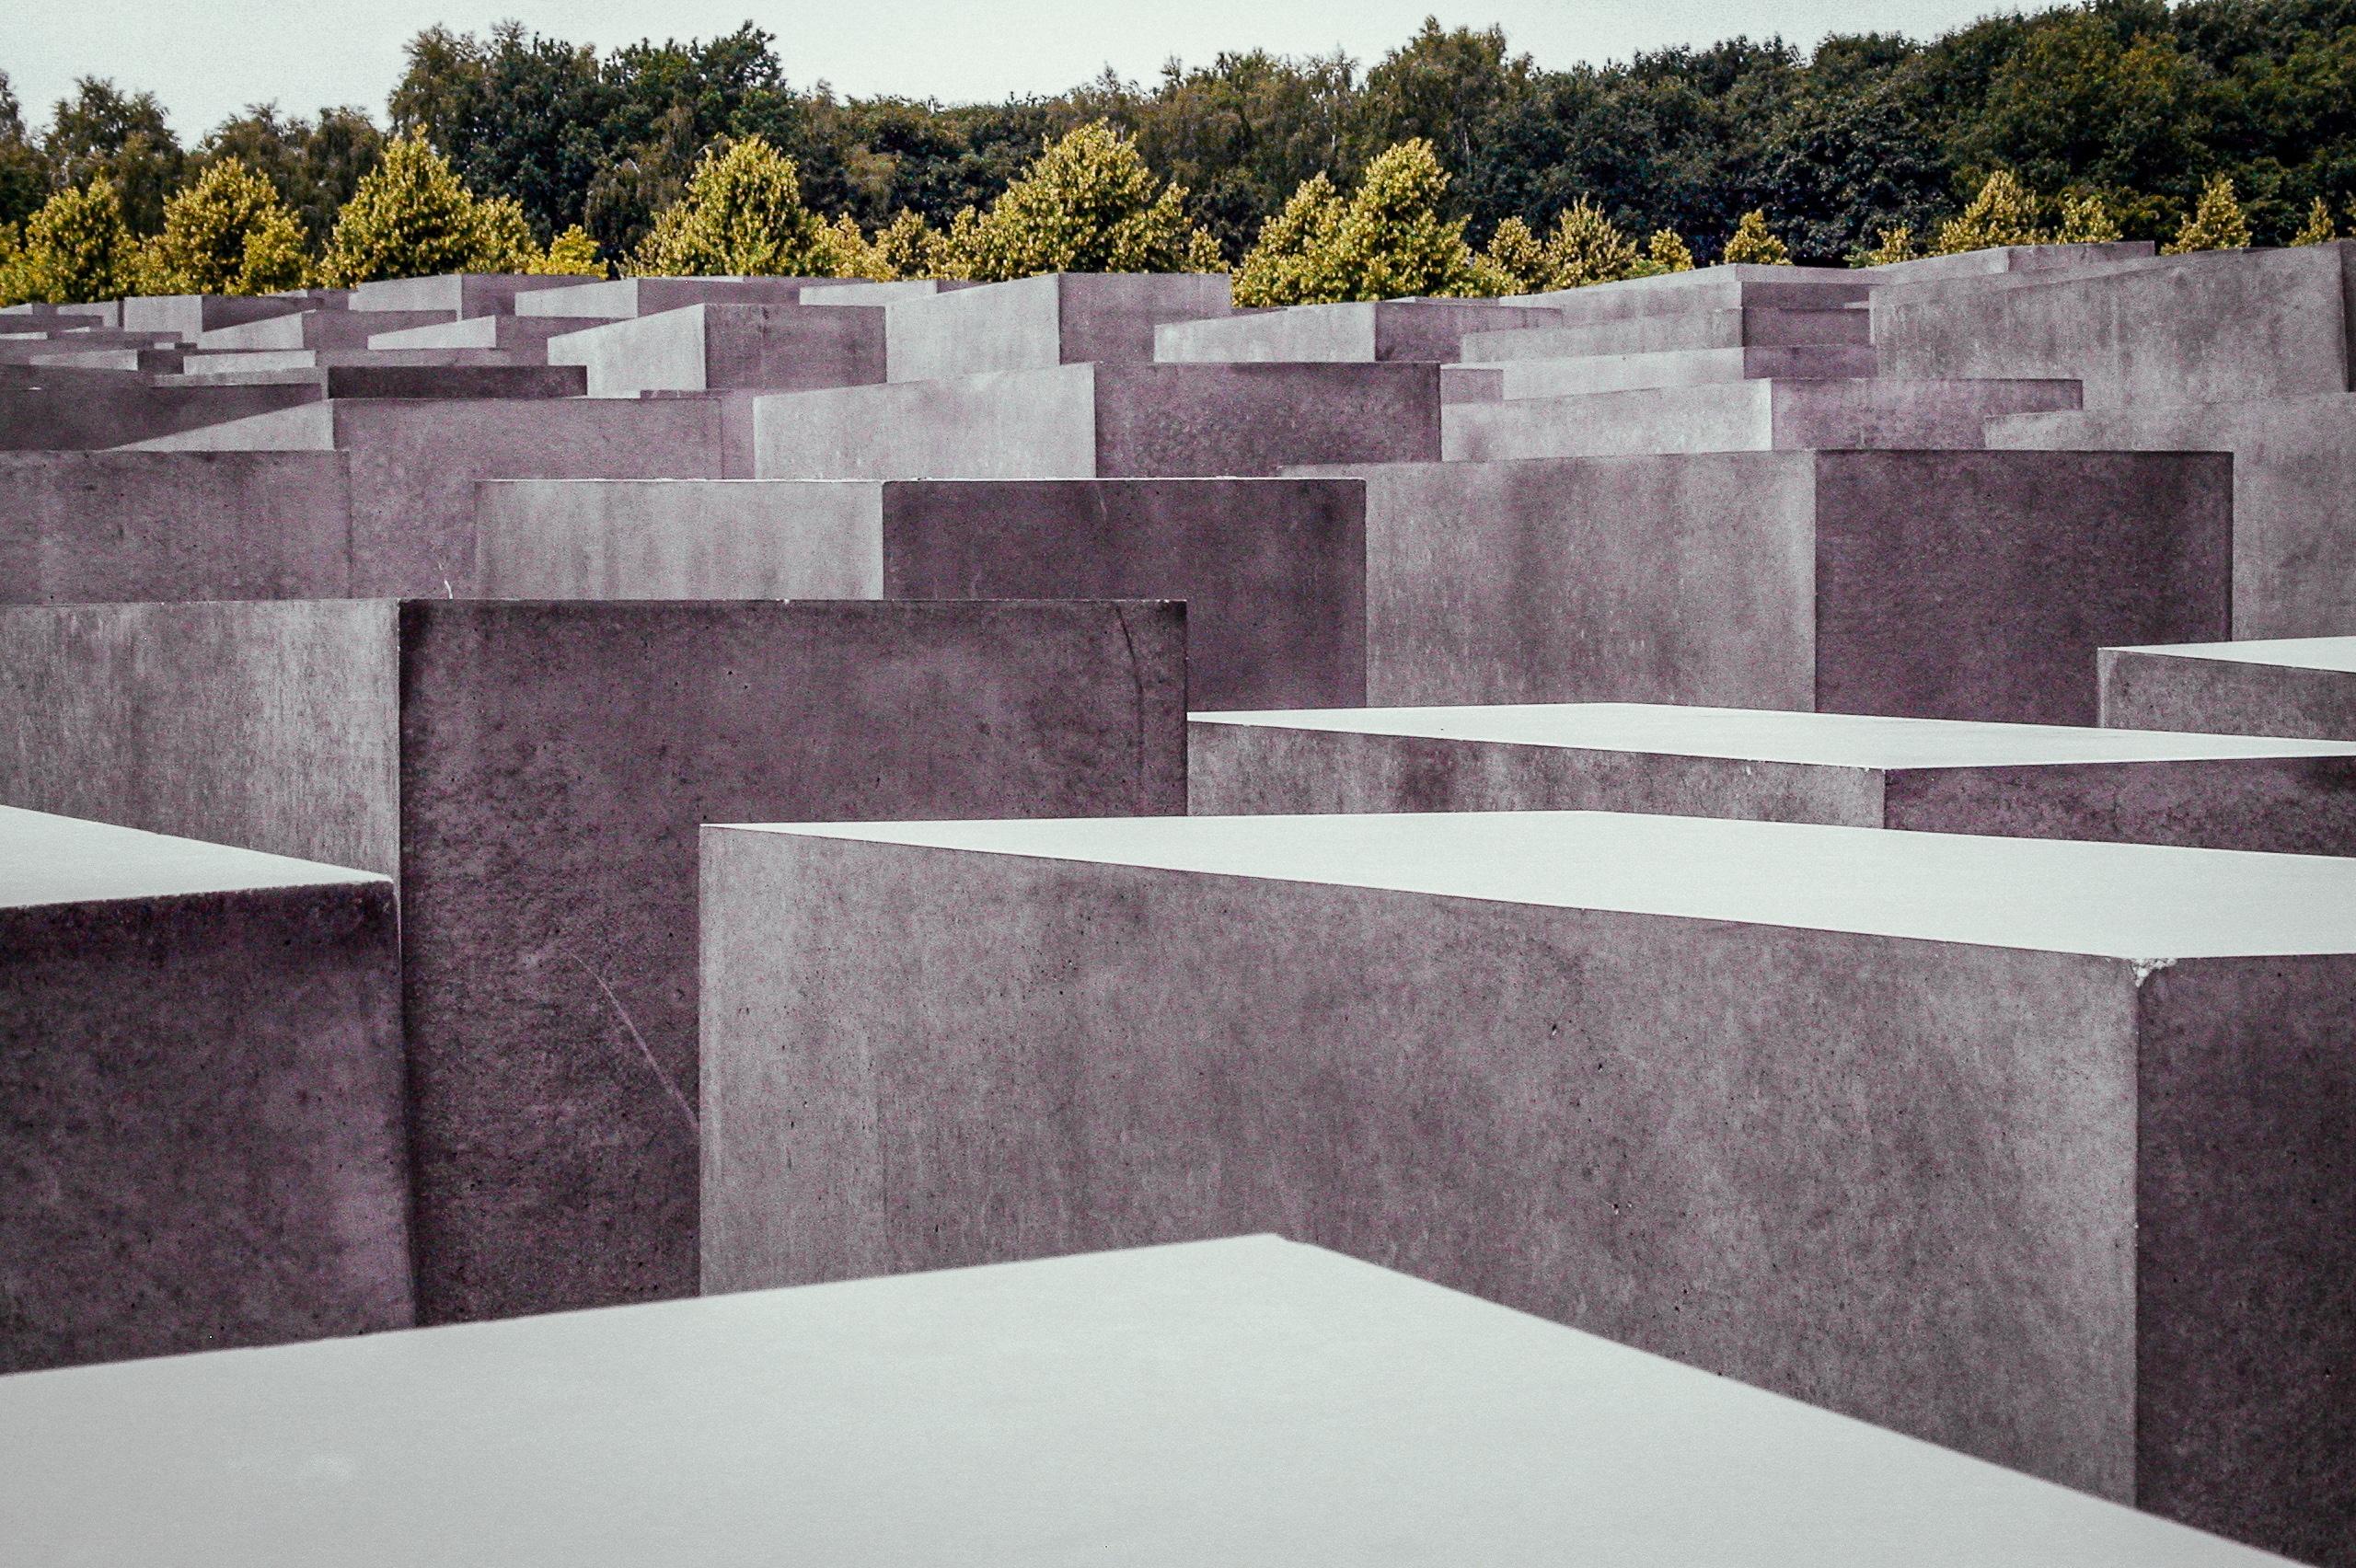 Memorial To The Murdered Jews Of Europe - Holocaust Memorial